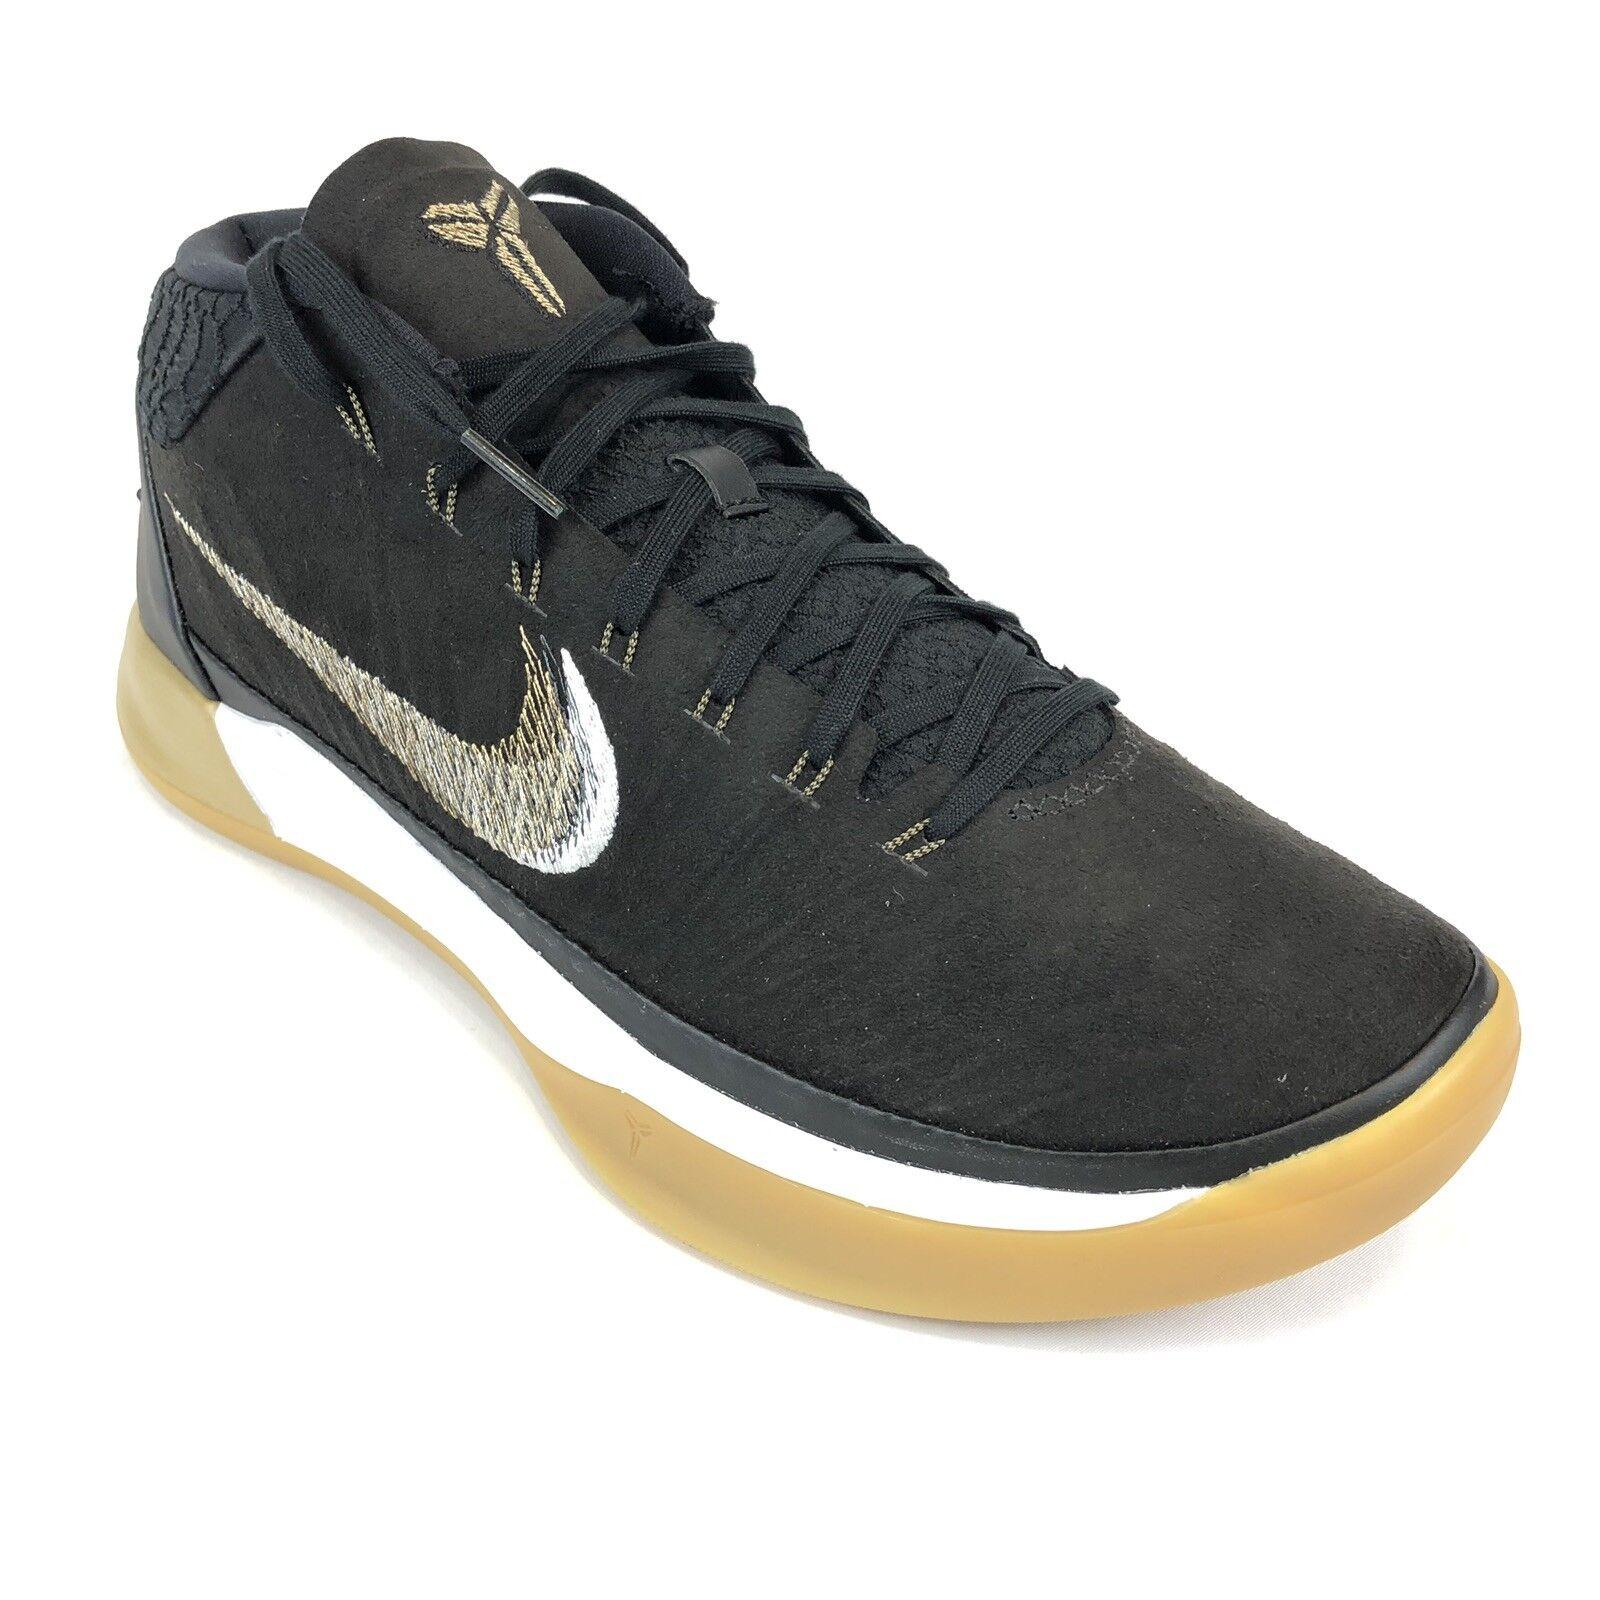 Nike Mens Kobe AD Black Metallic gold Anthracite Basketball Sneakers Gum 922482